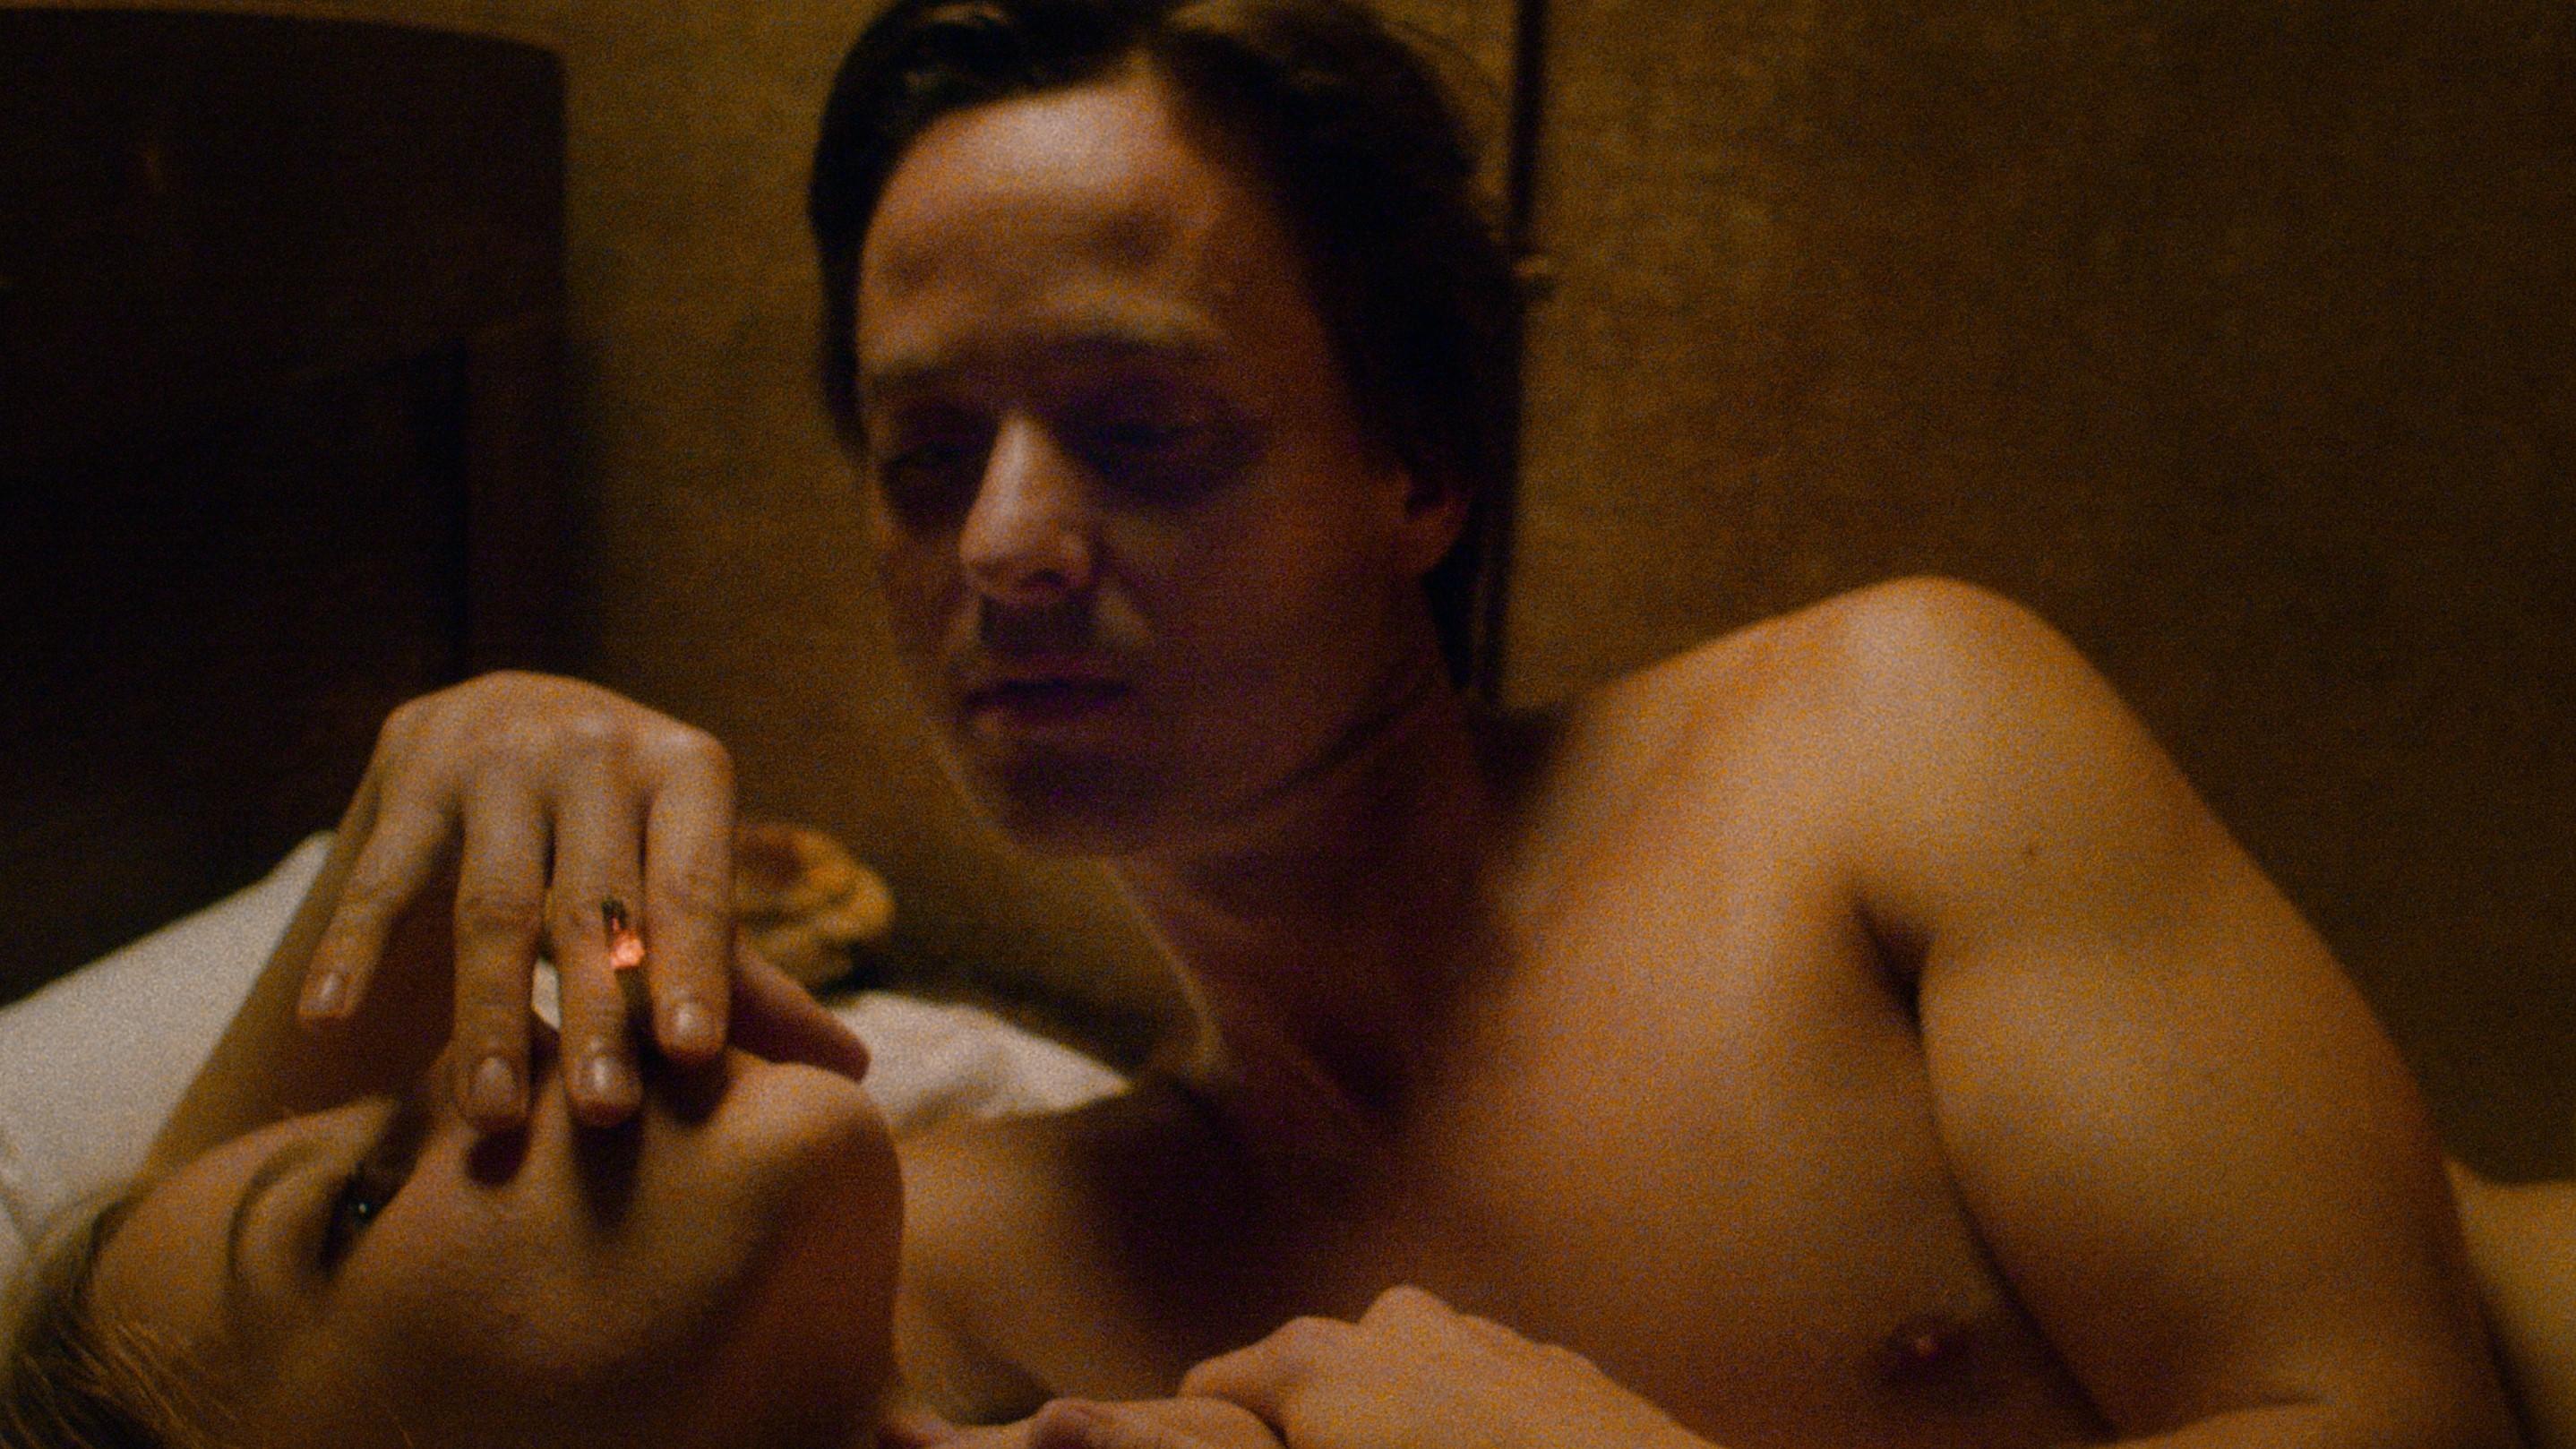 'fabian'-director-dominik-graf-on-today's-weimar-era,-sexuality,-tom-schilling-and-the-grandiose-madame-de-stael